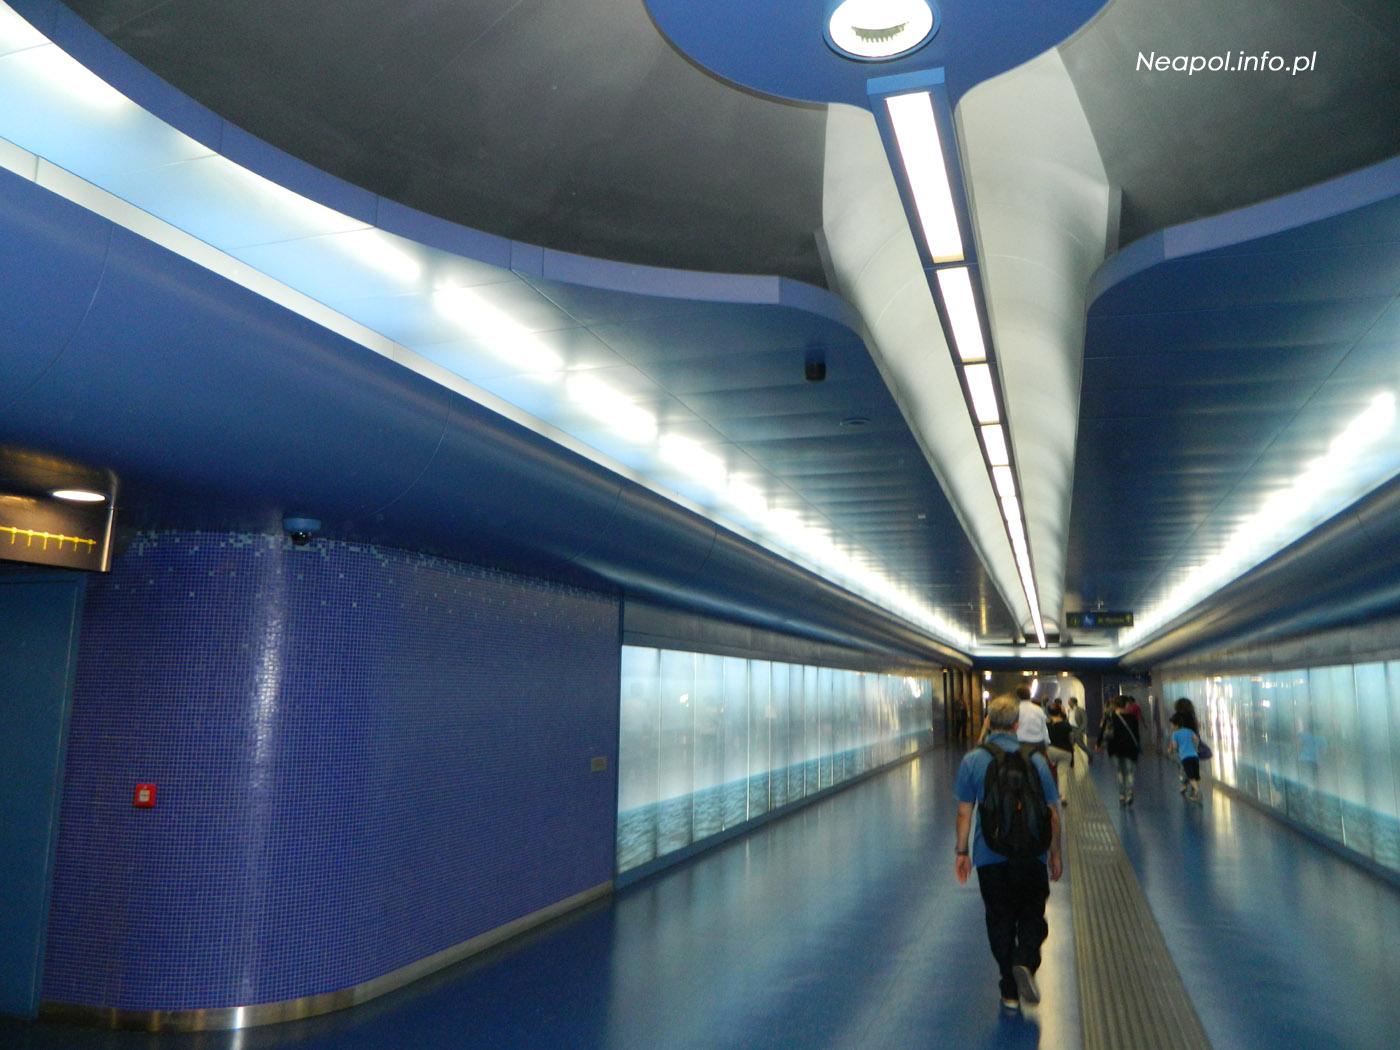 Metro Neapol